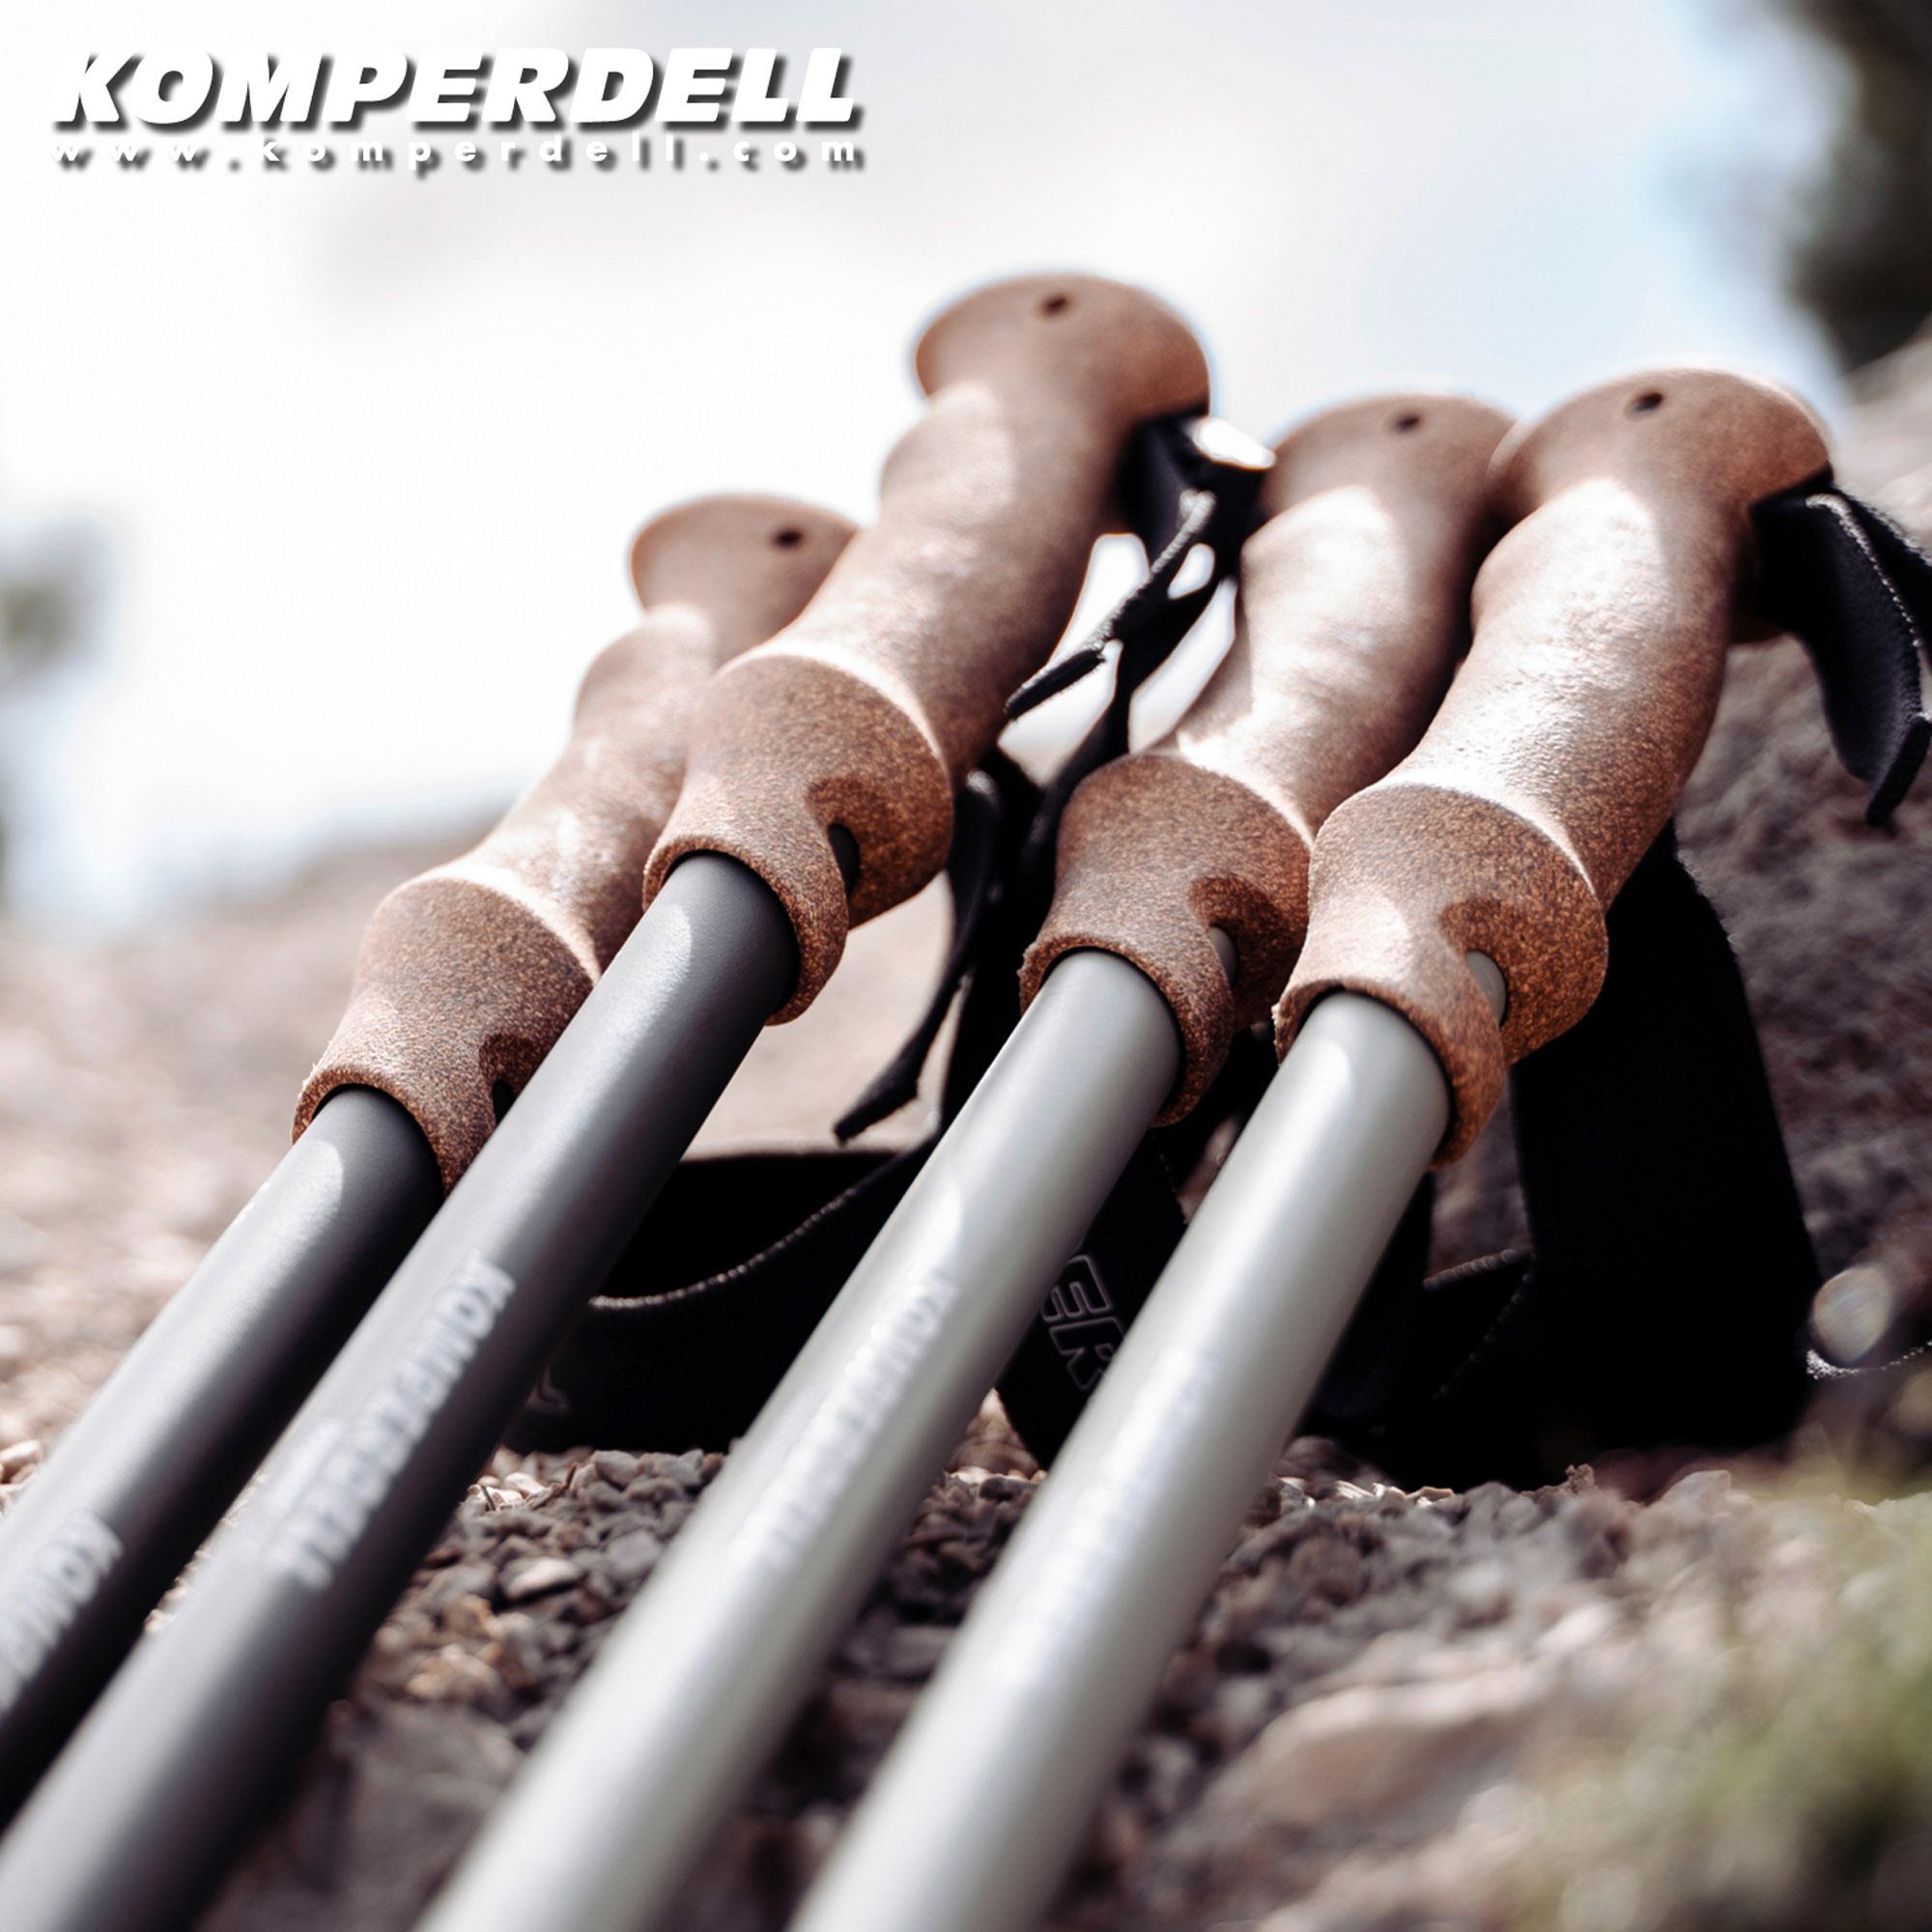 Ridgehiker Cork Powerlock Compact Action